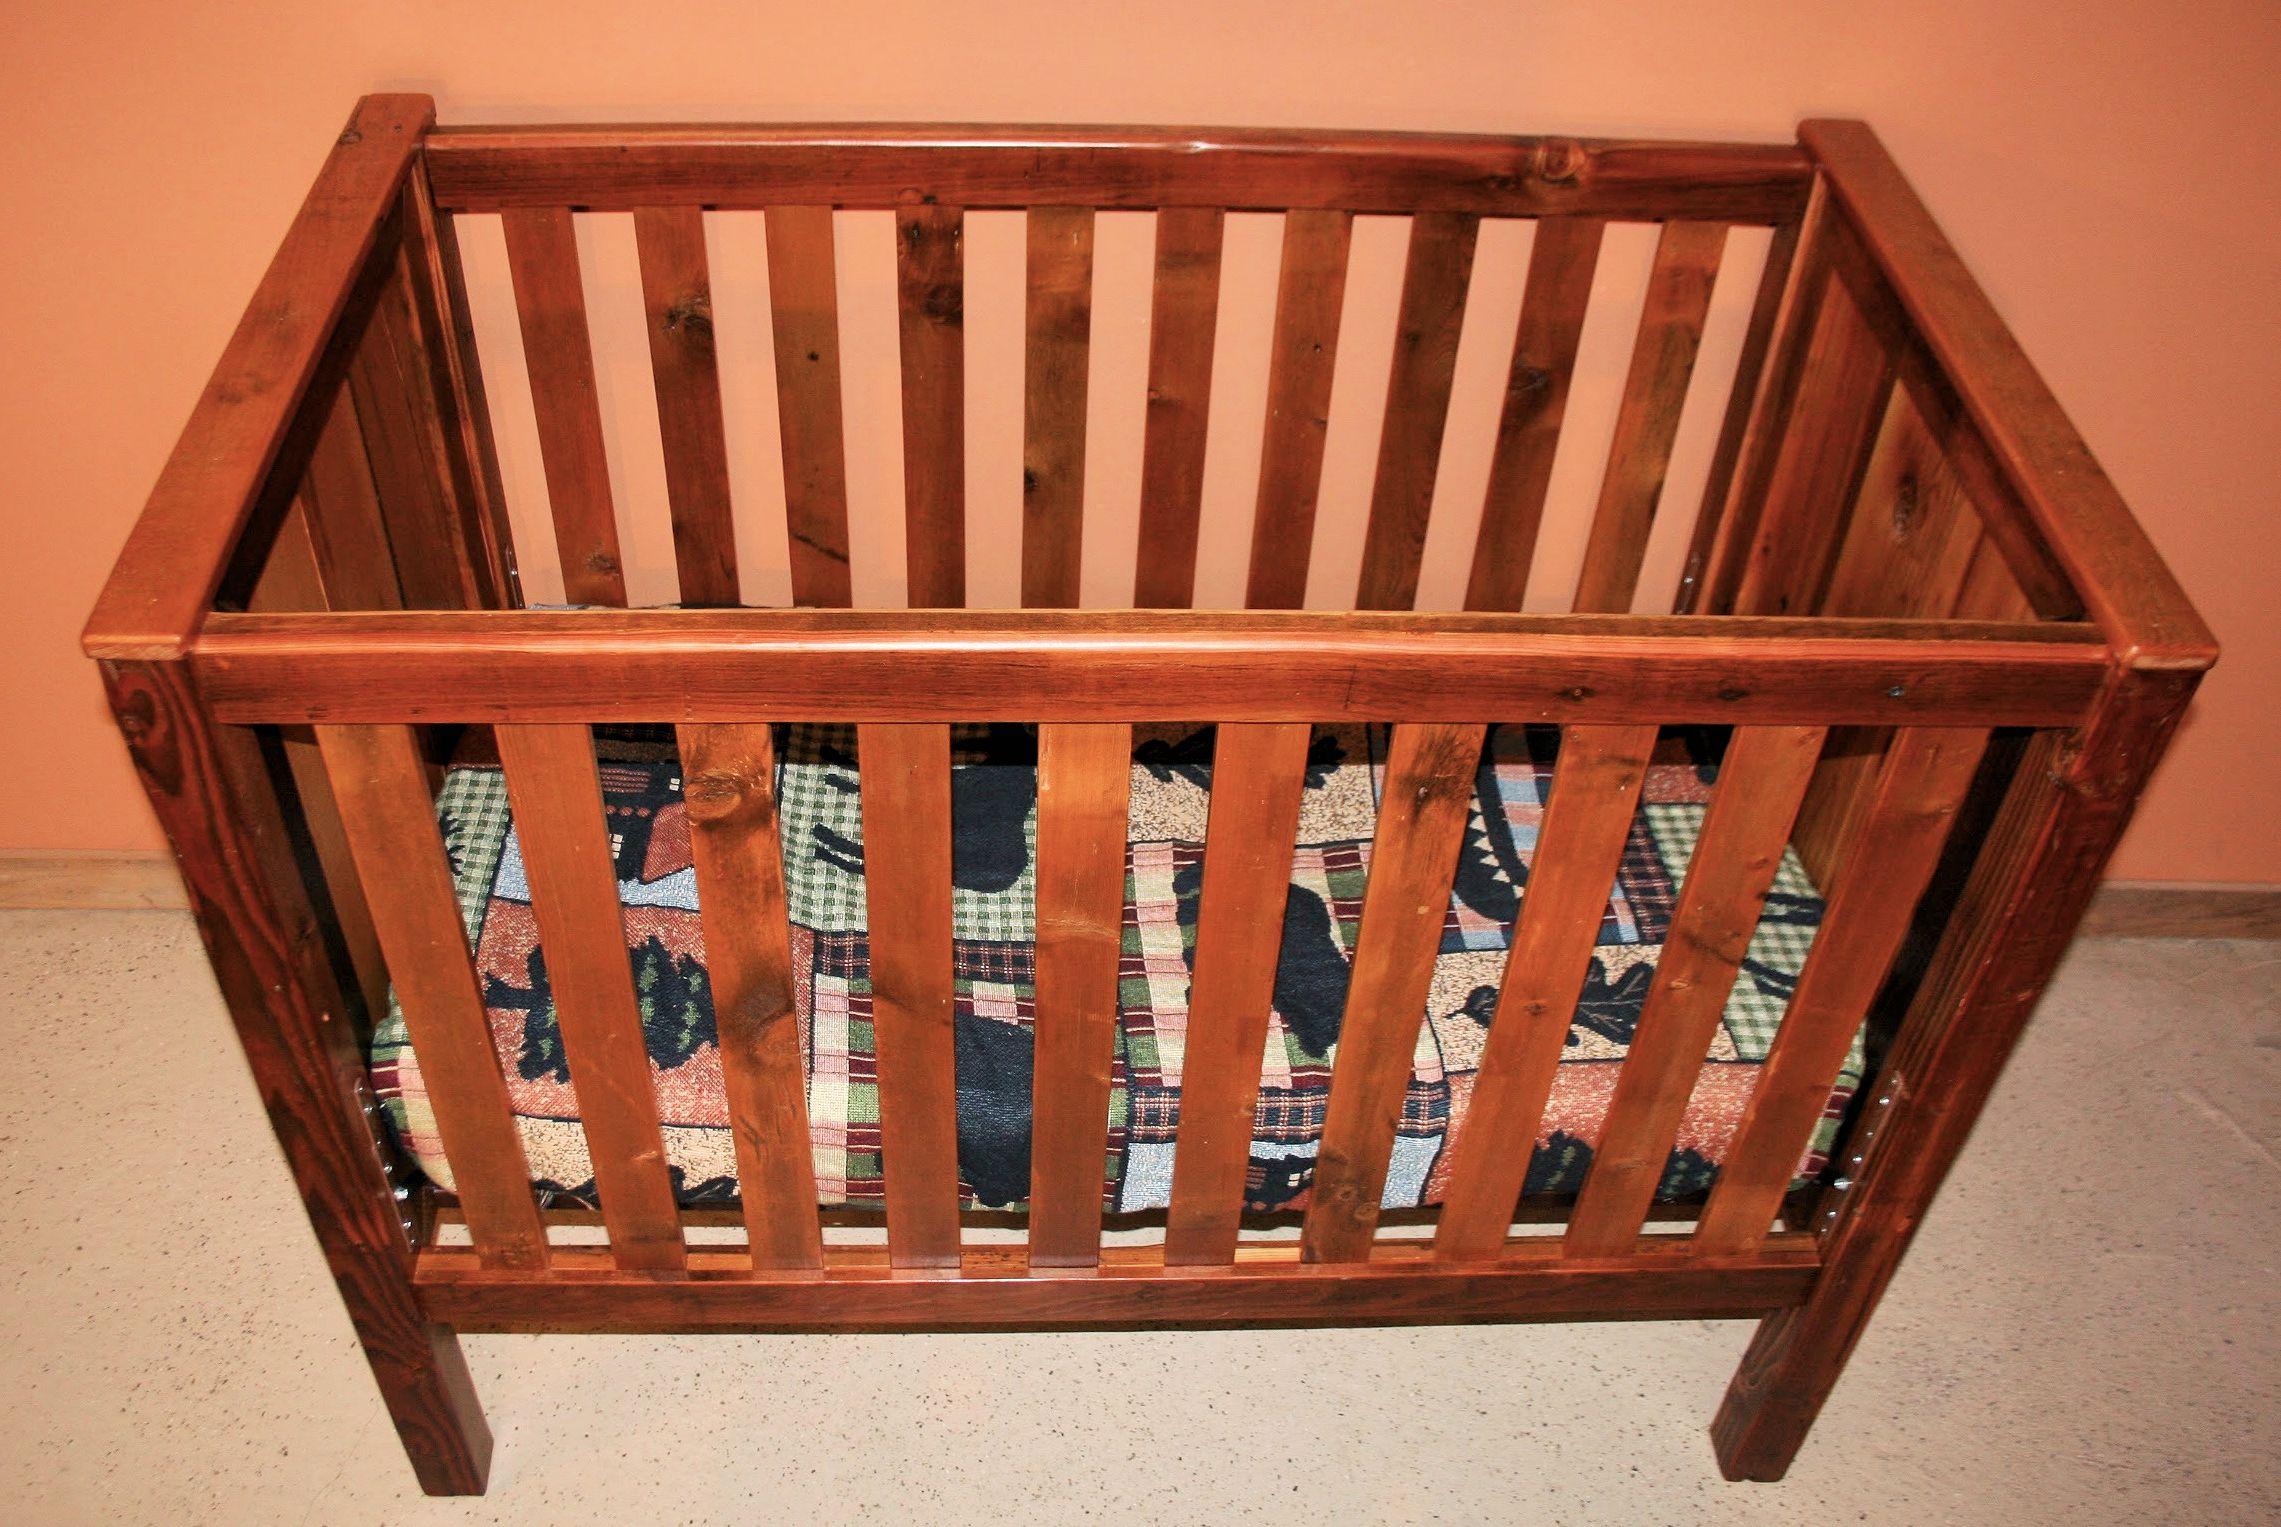 barnwood-baby-crib-2000004.jpg